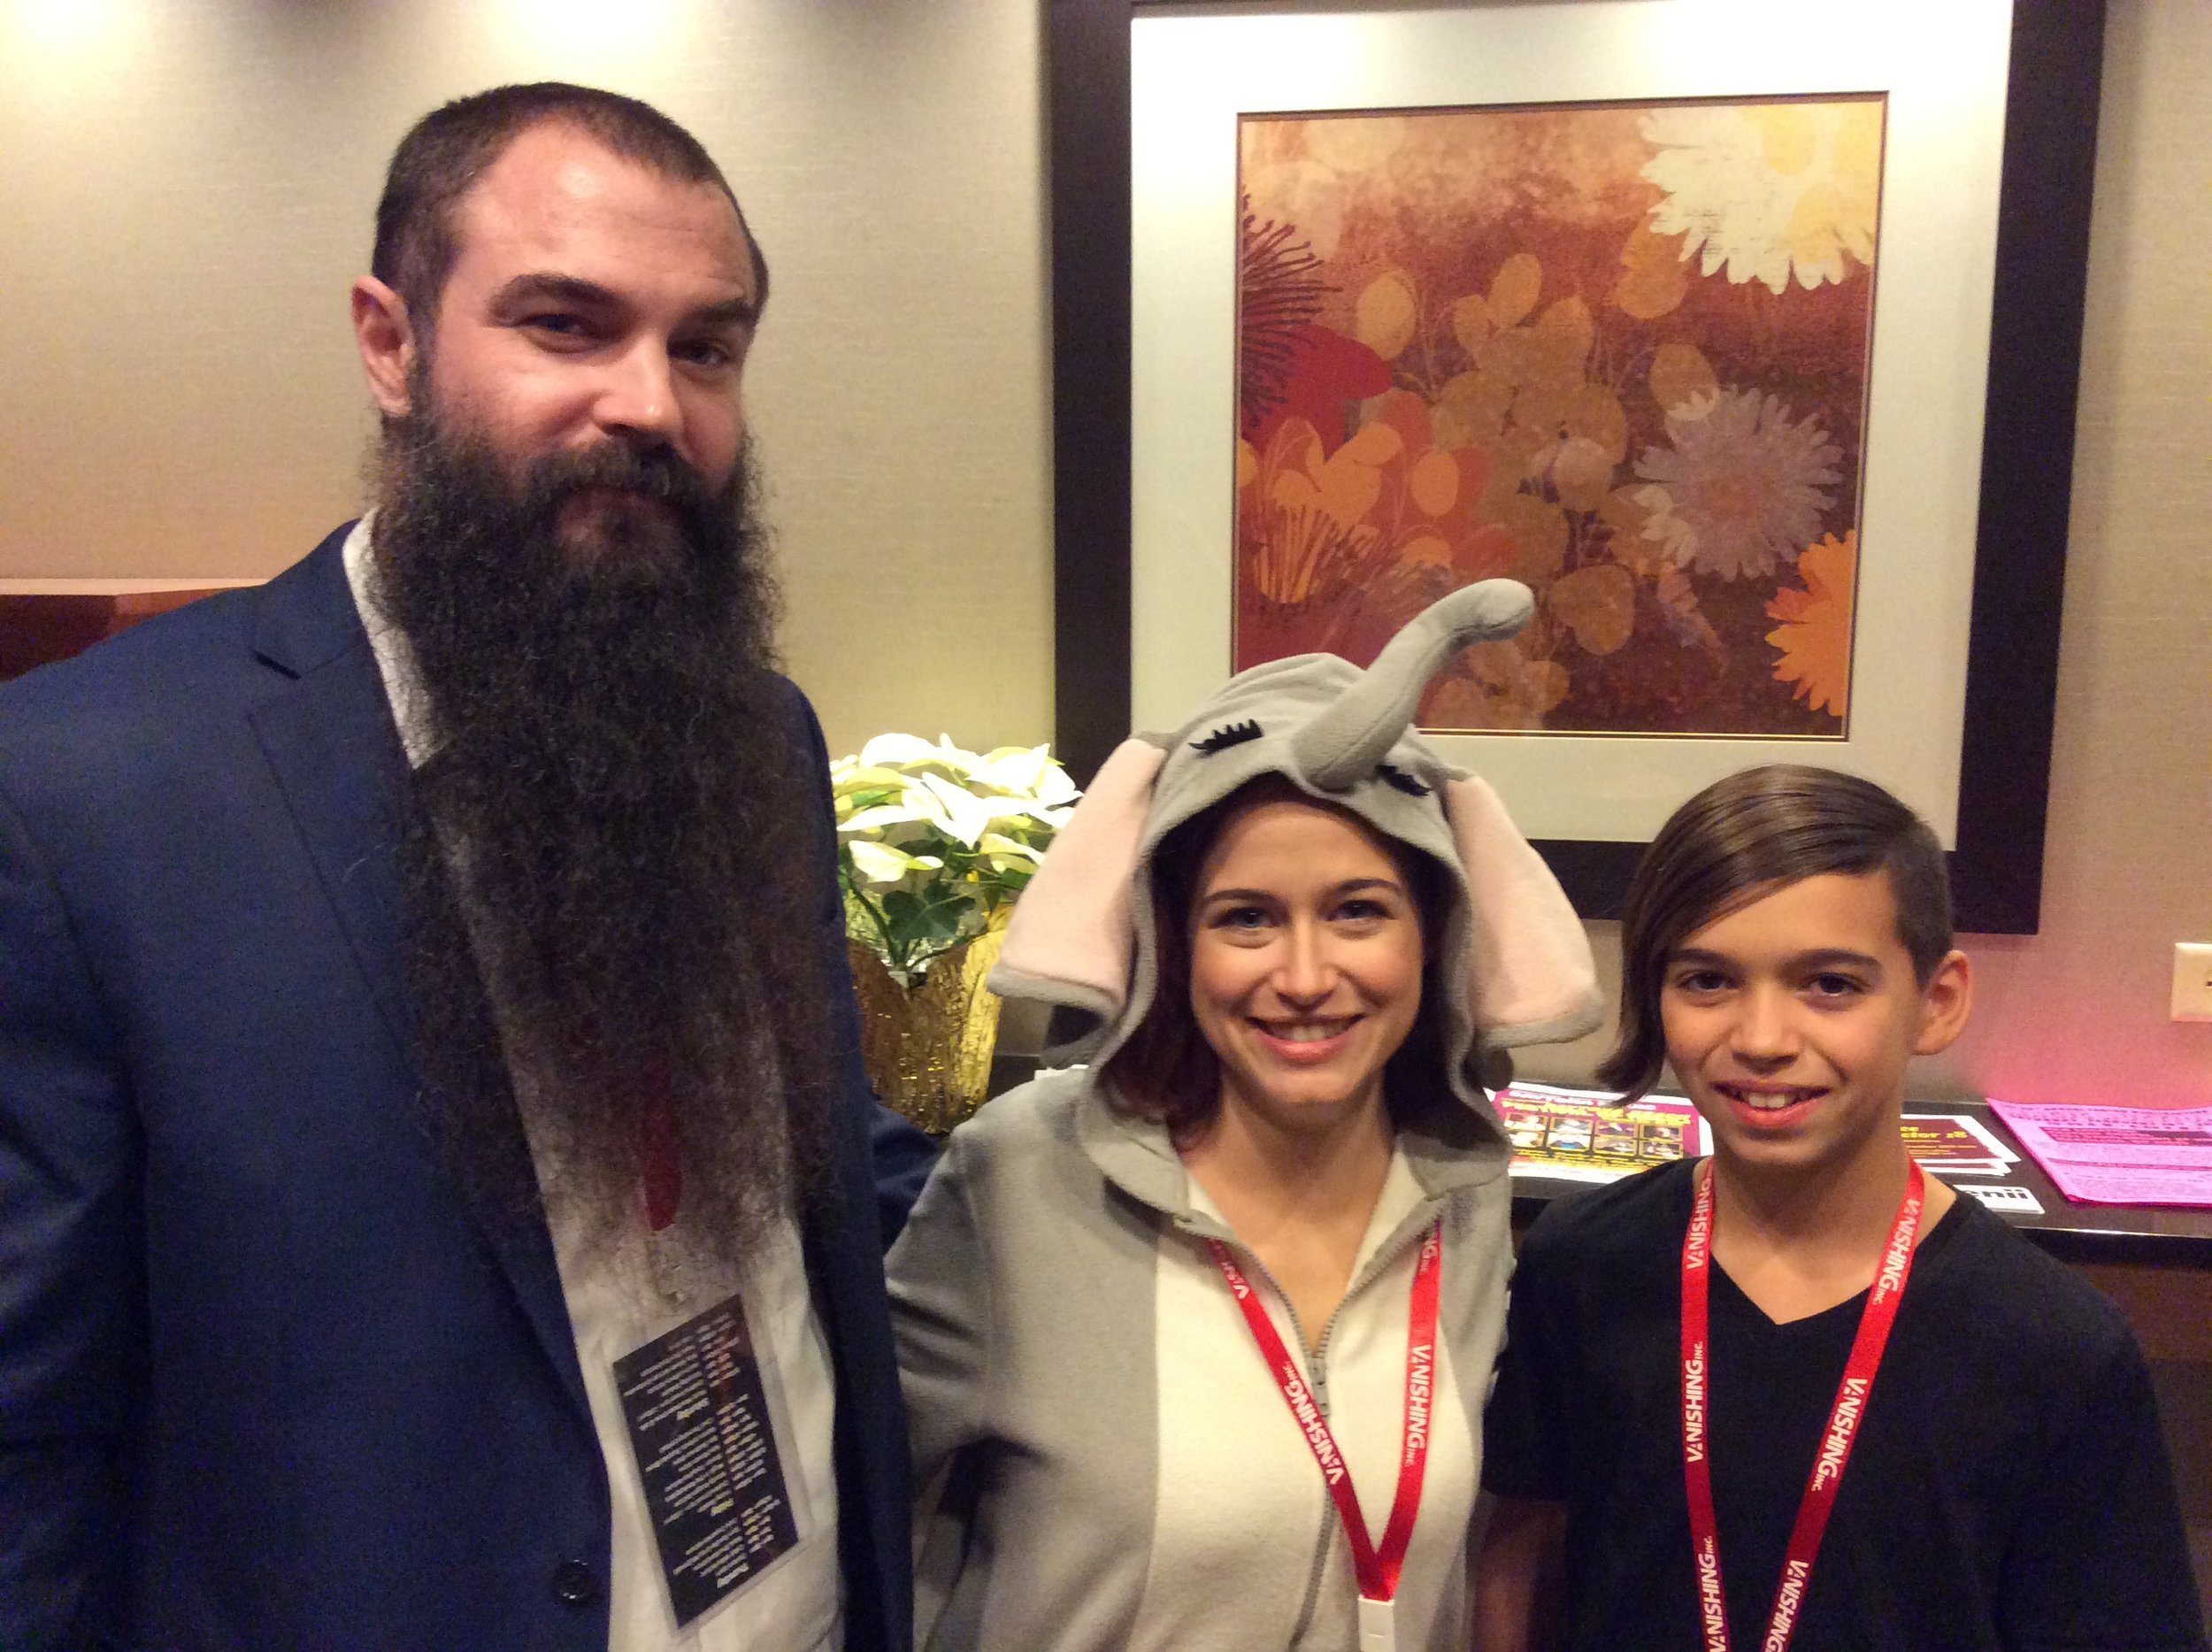 David, Sarah and Cooper Trustman